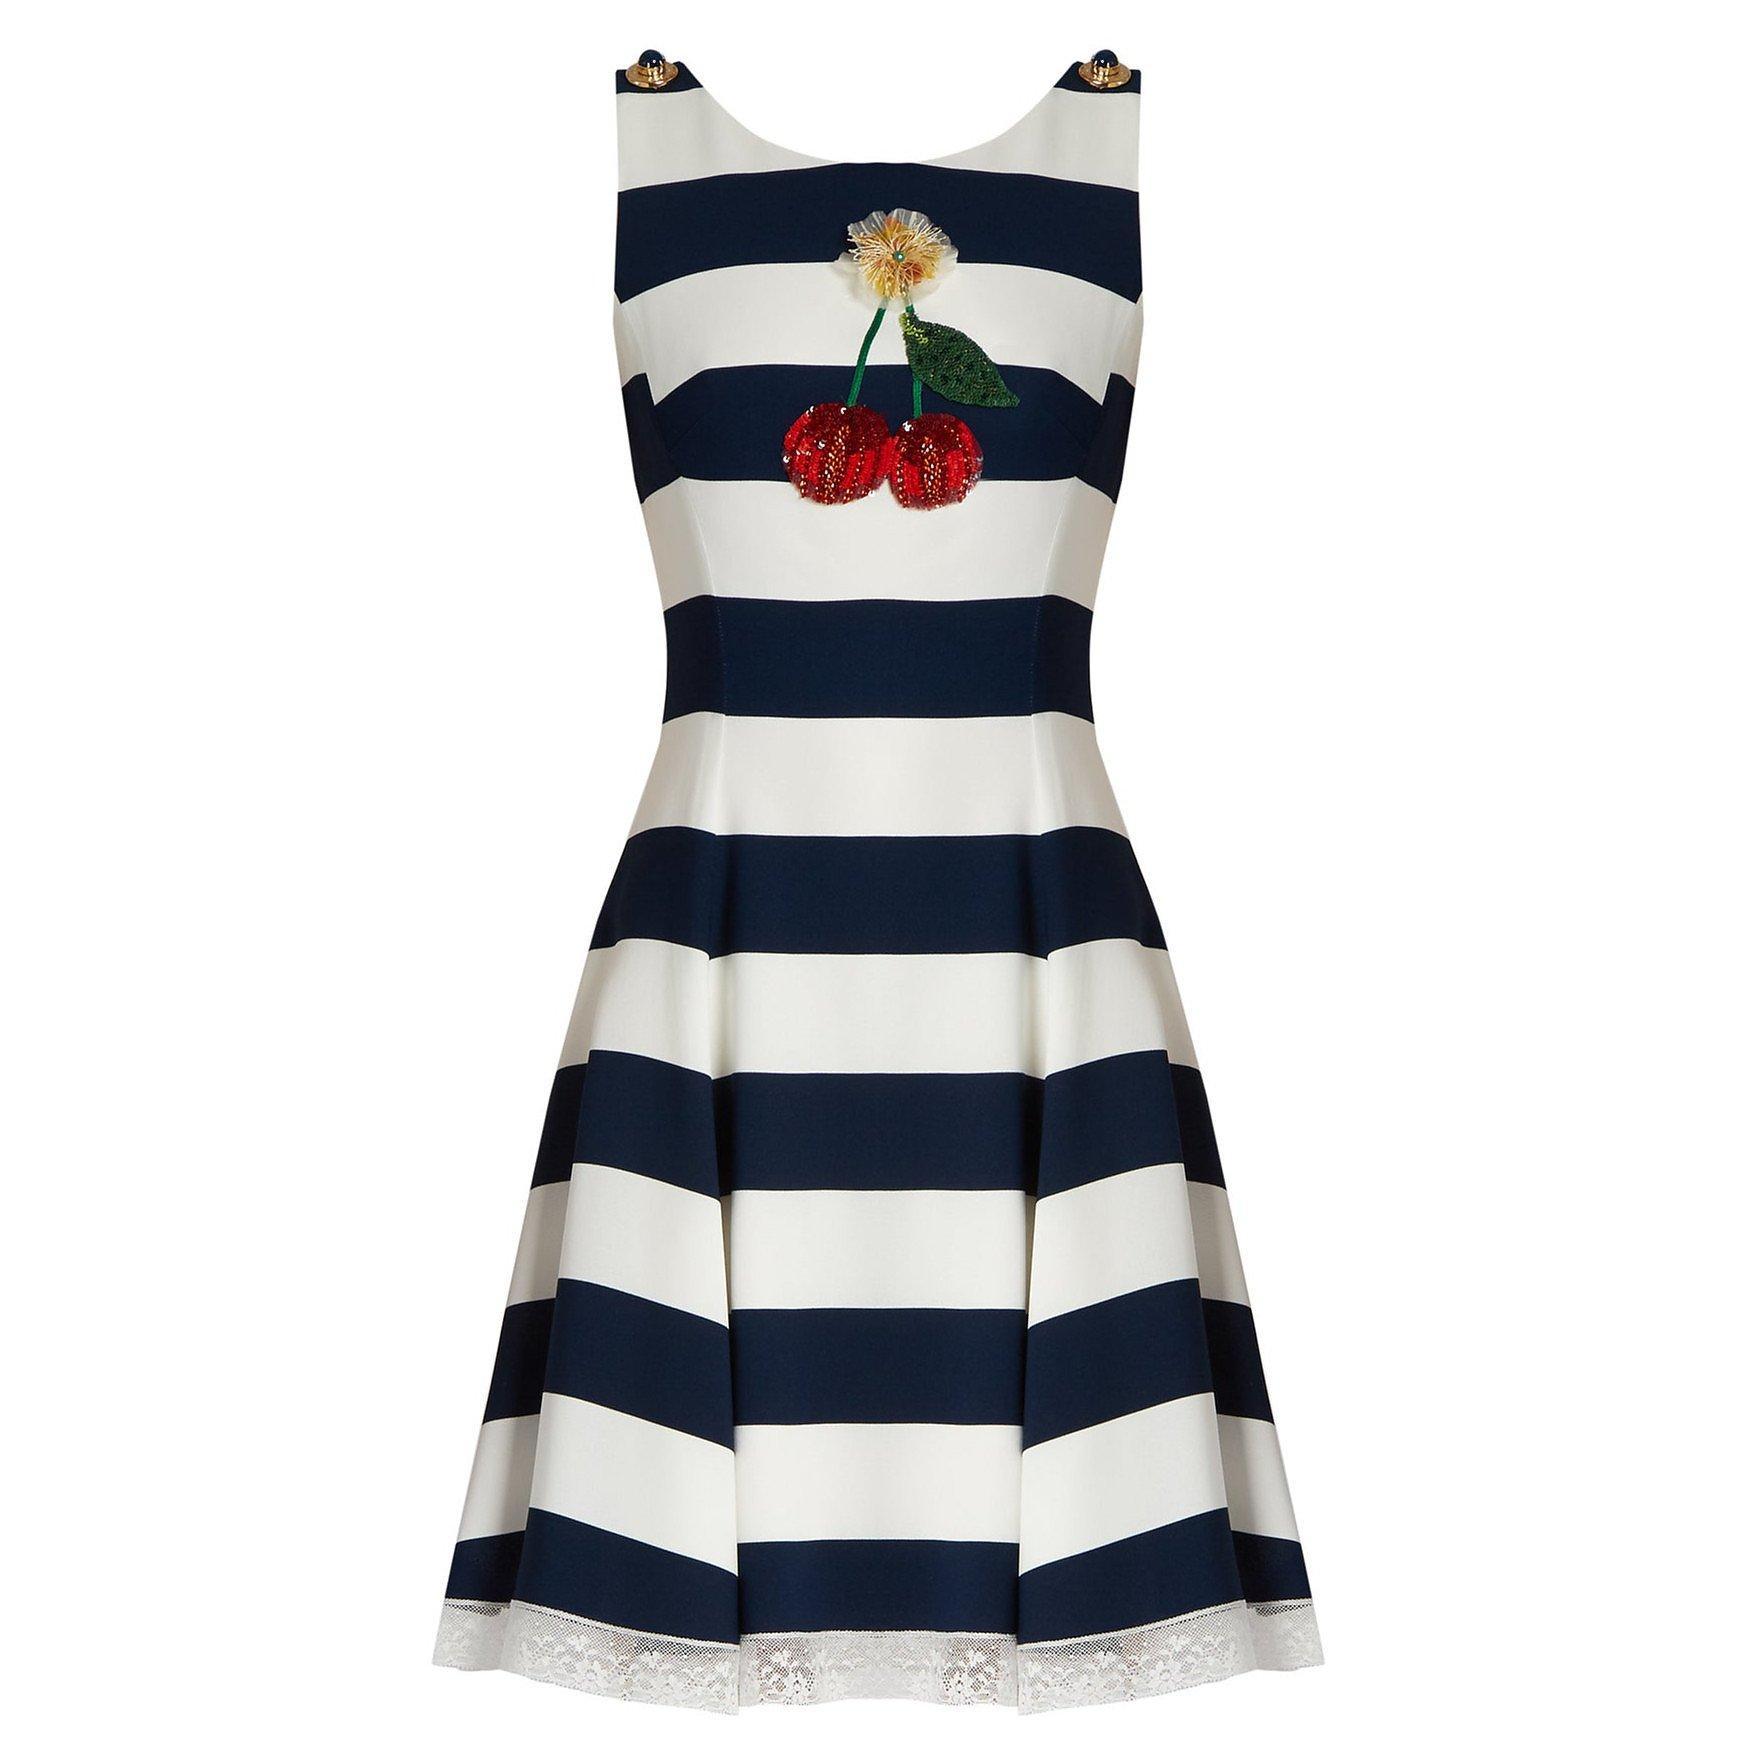 DOLCE & GABBANA Cherry-Embellished Striped Cady Dress